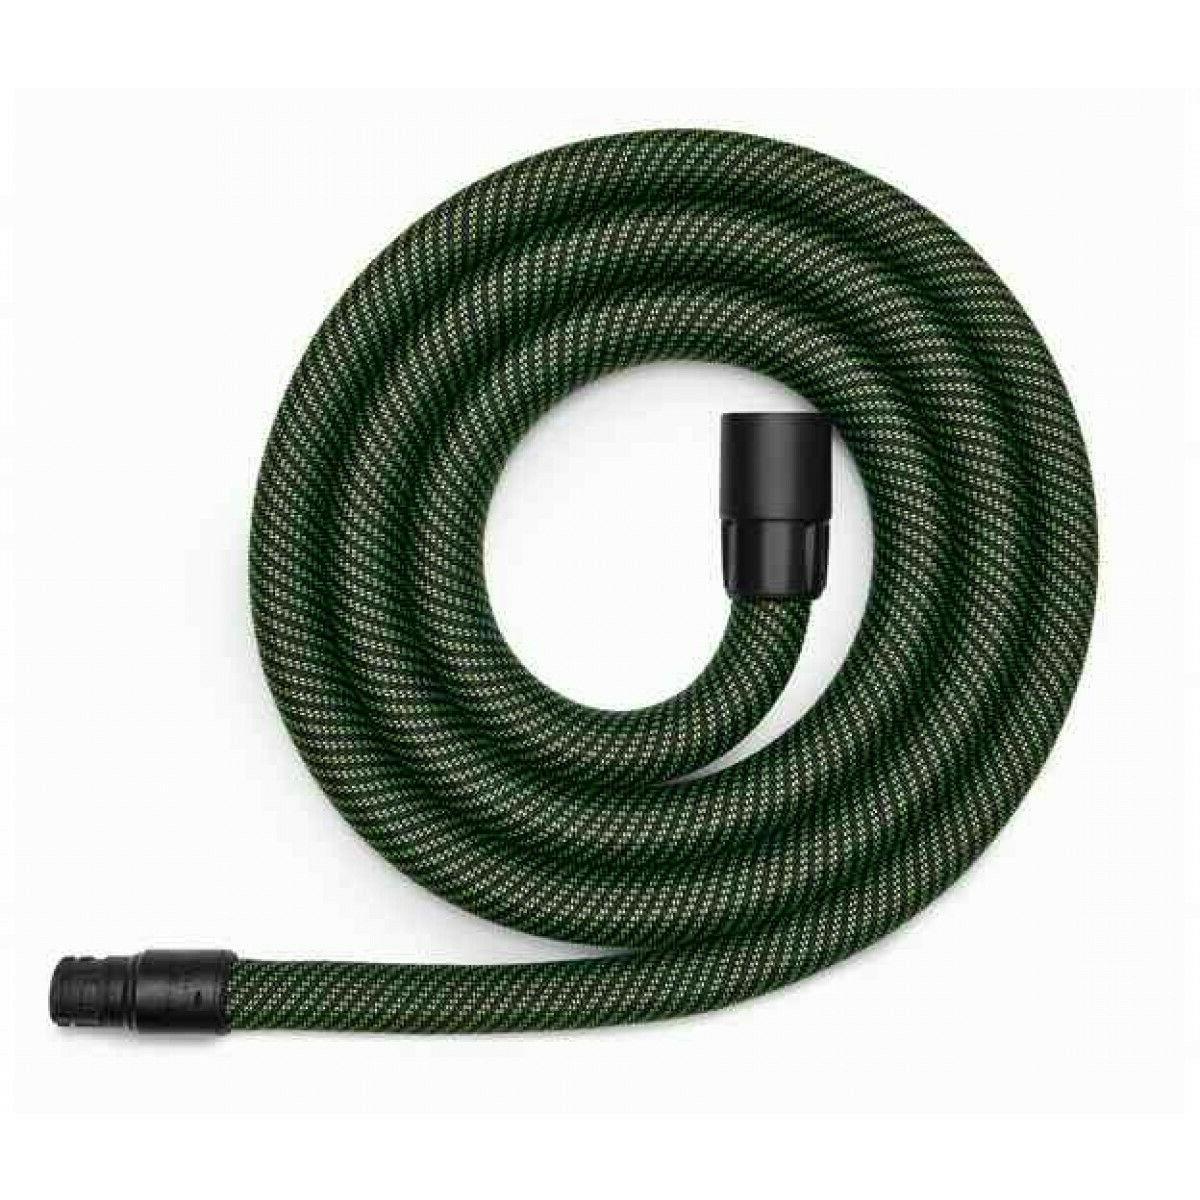 Festool 27/32 x 5m Vacuum Hose; New